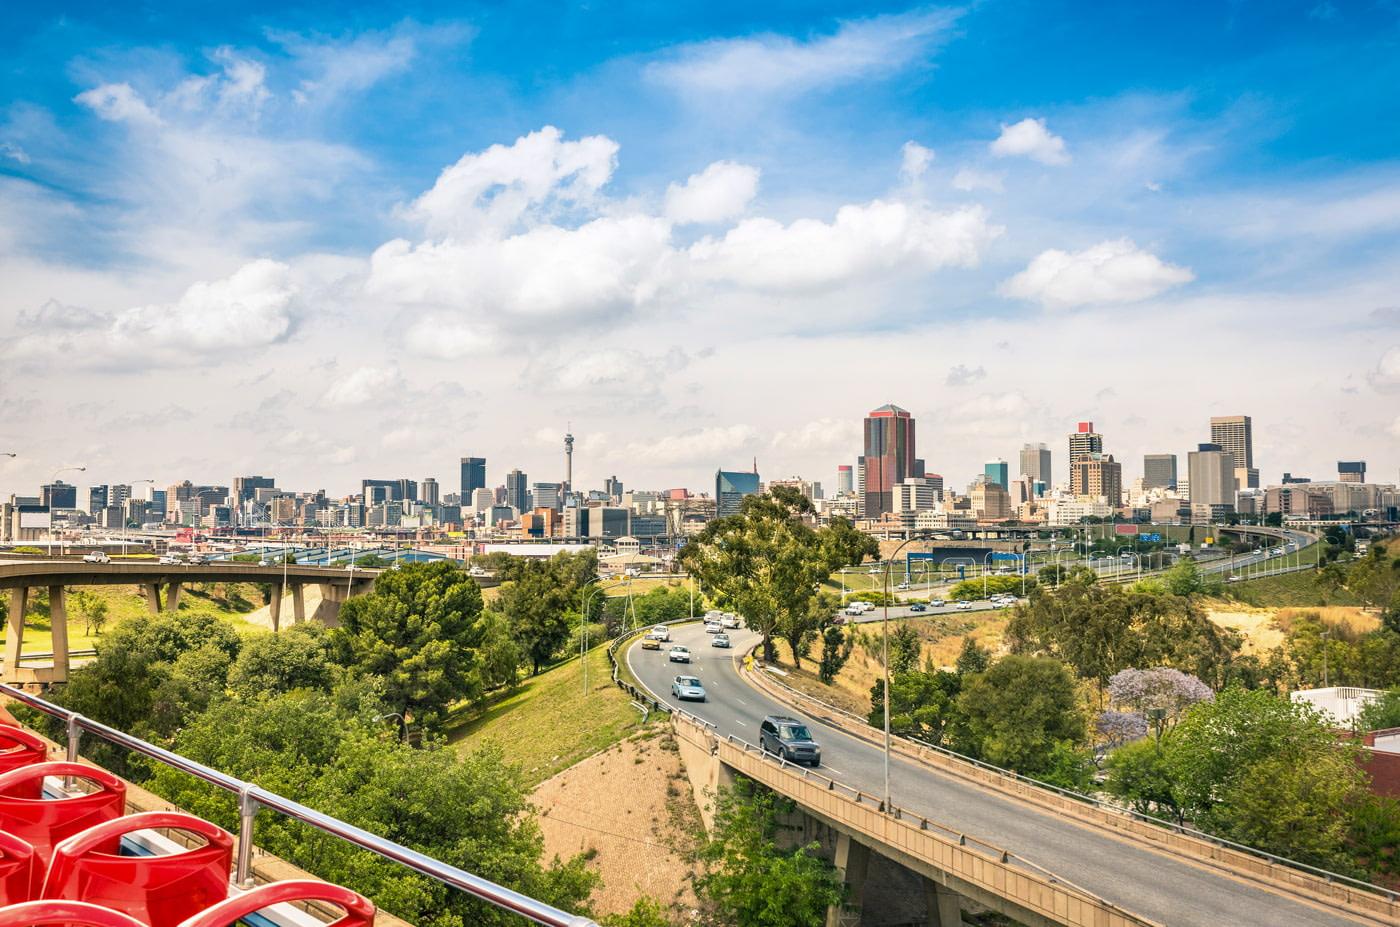 Johannesburg facts